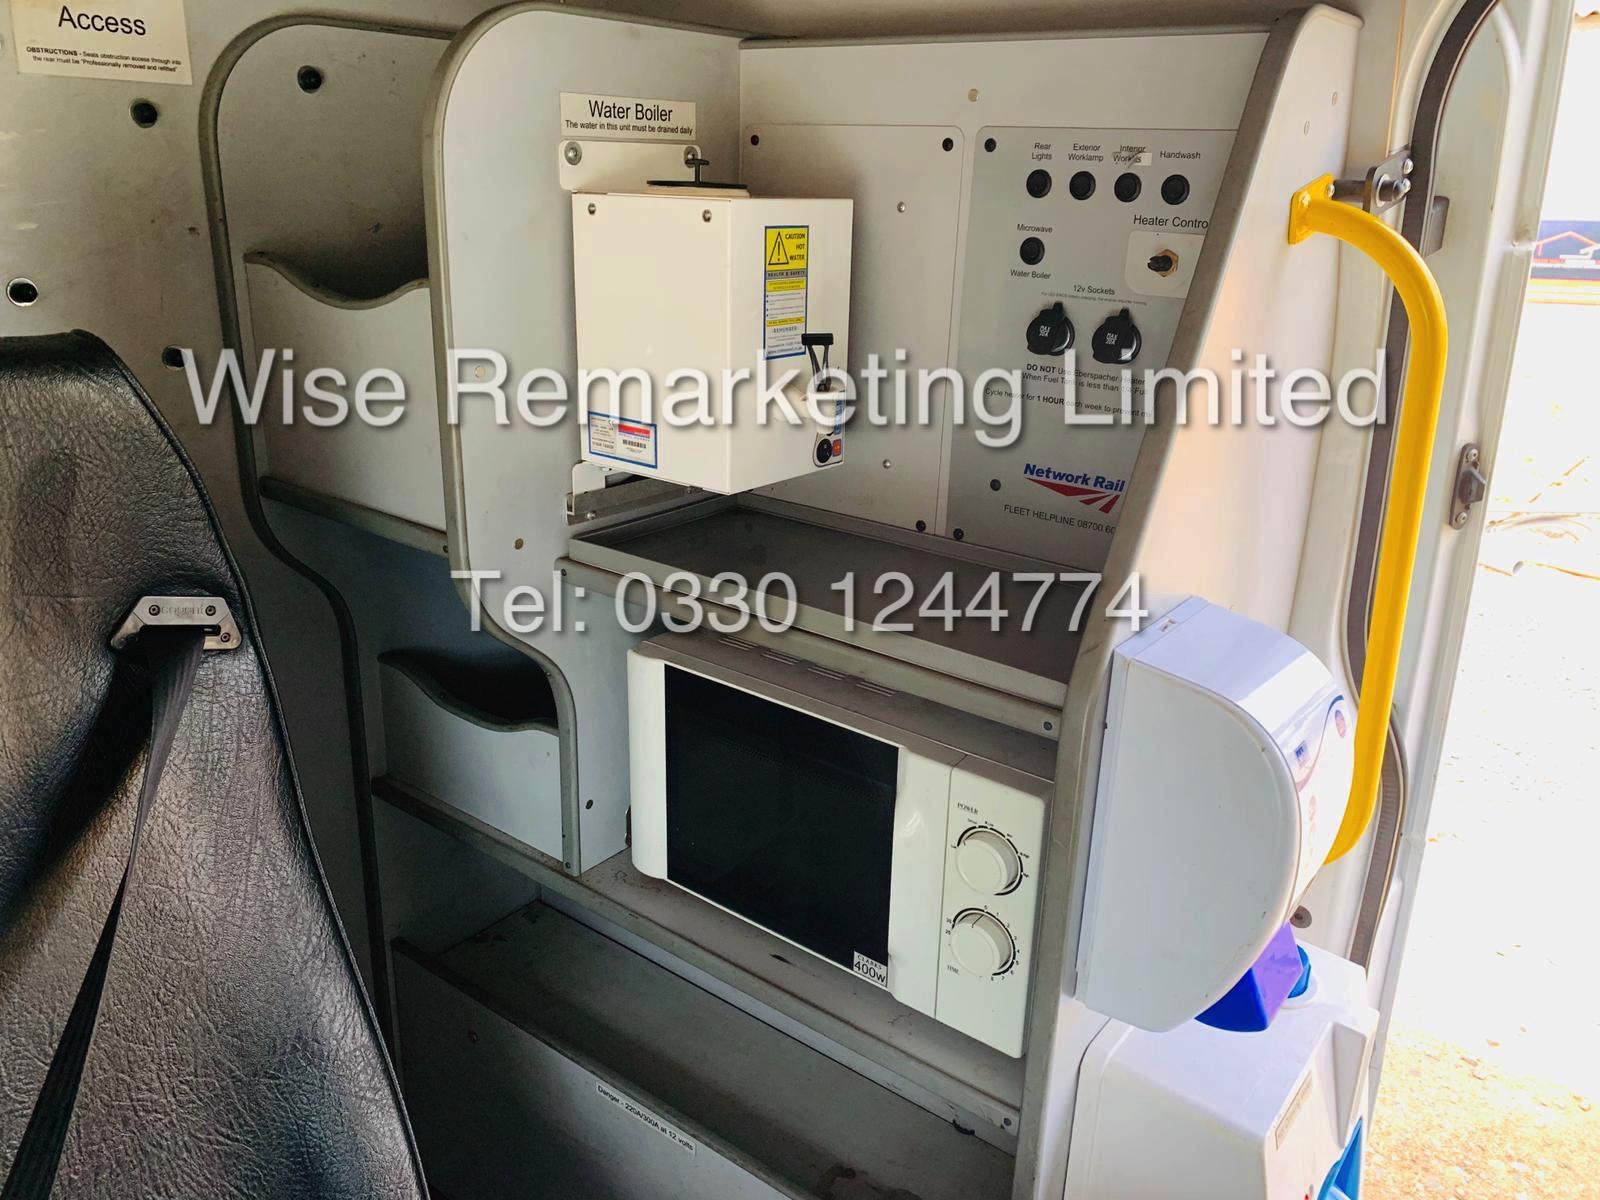 FORD TRANSIT T350L 2.4 TDCI *8 SEATER CREW VAN* (MESSING UNIT) 11 REG - Image 18 of 21